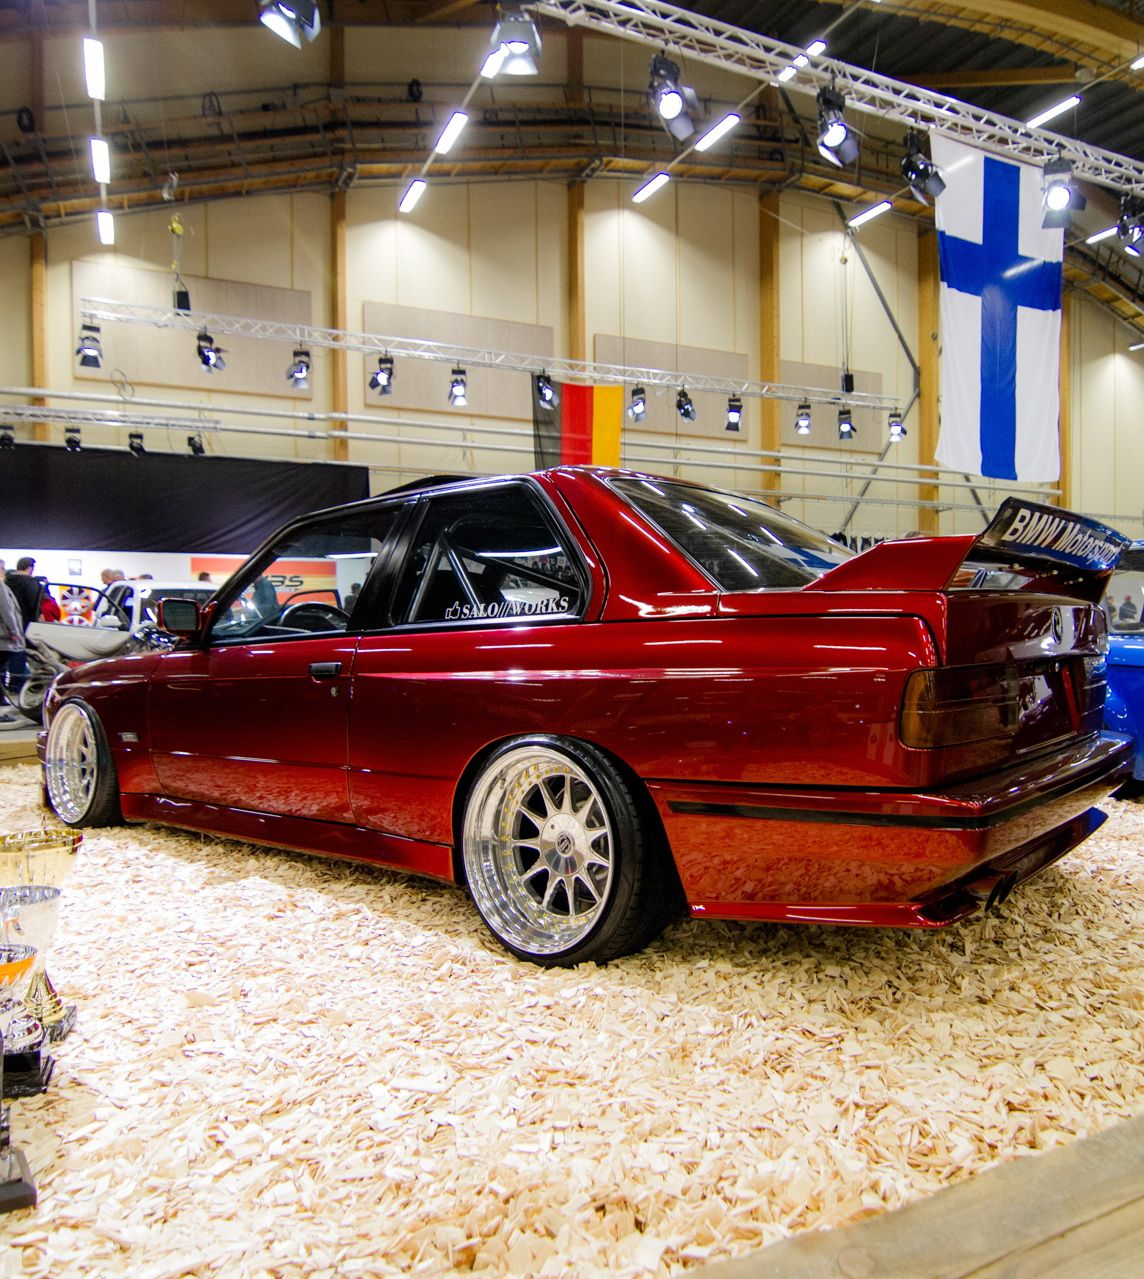 Bmw M3 Motor E30: Motor, Autók